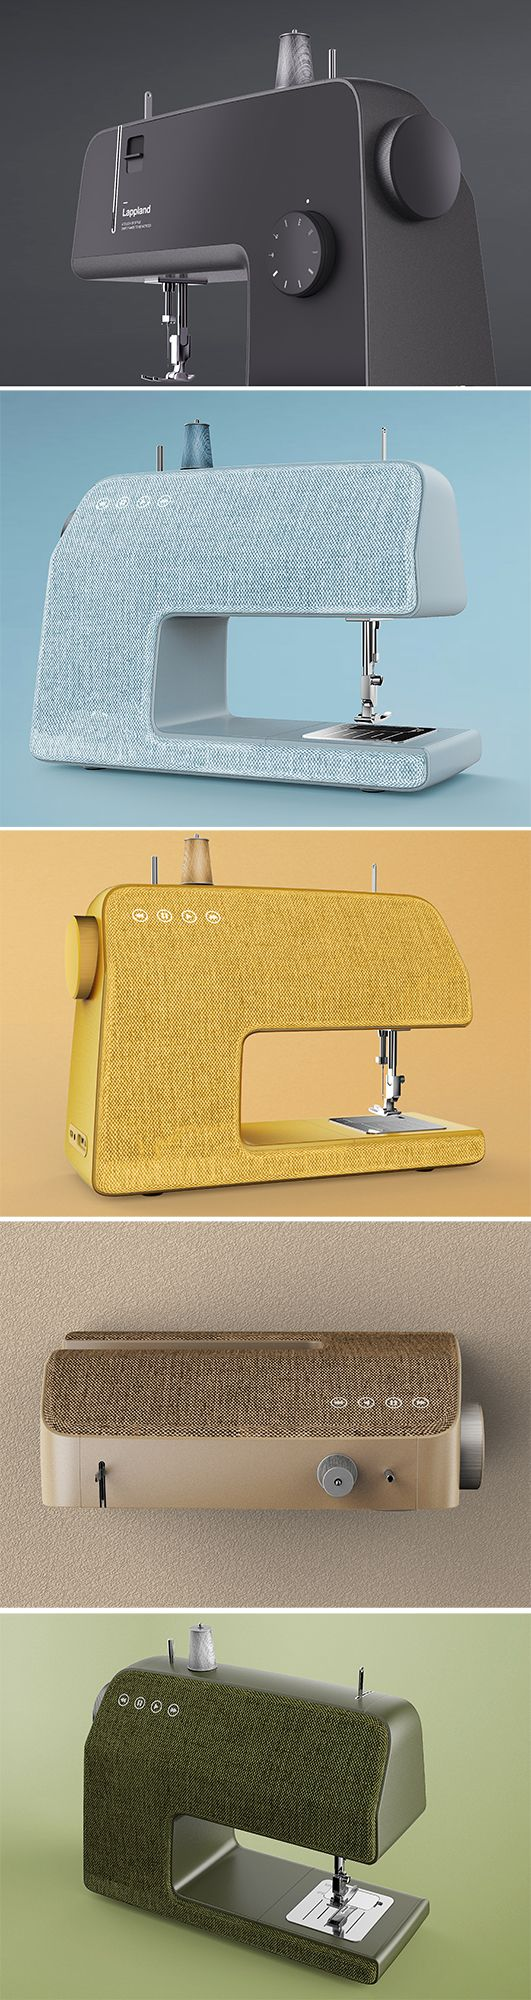 PDF HAUS_ Republic of Korea Design Academy / Product design / Industrial design / 工业设计 / 产品设计/ 空气净化器 / 산업디자인 / vifa / 비파 / sewing machine / 미싱기